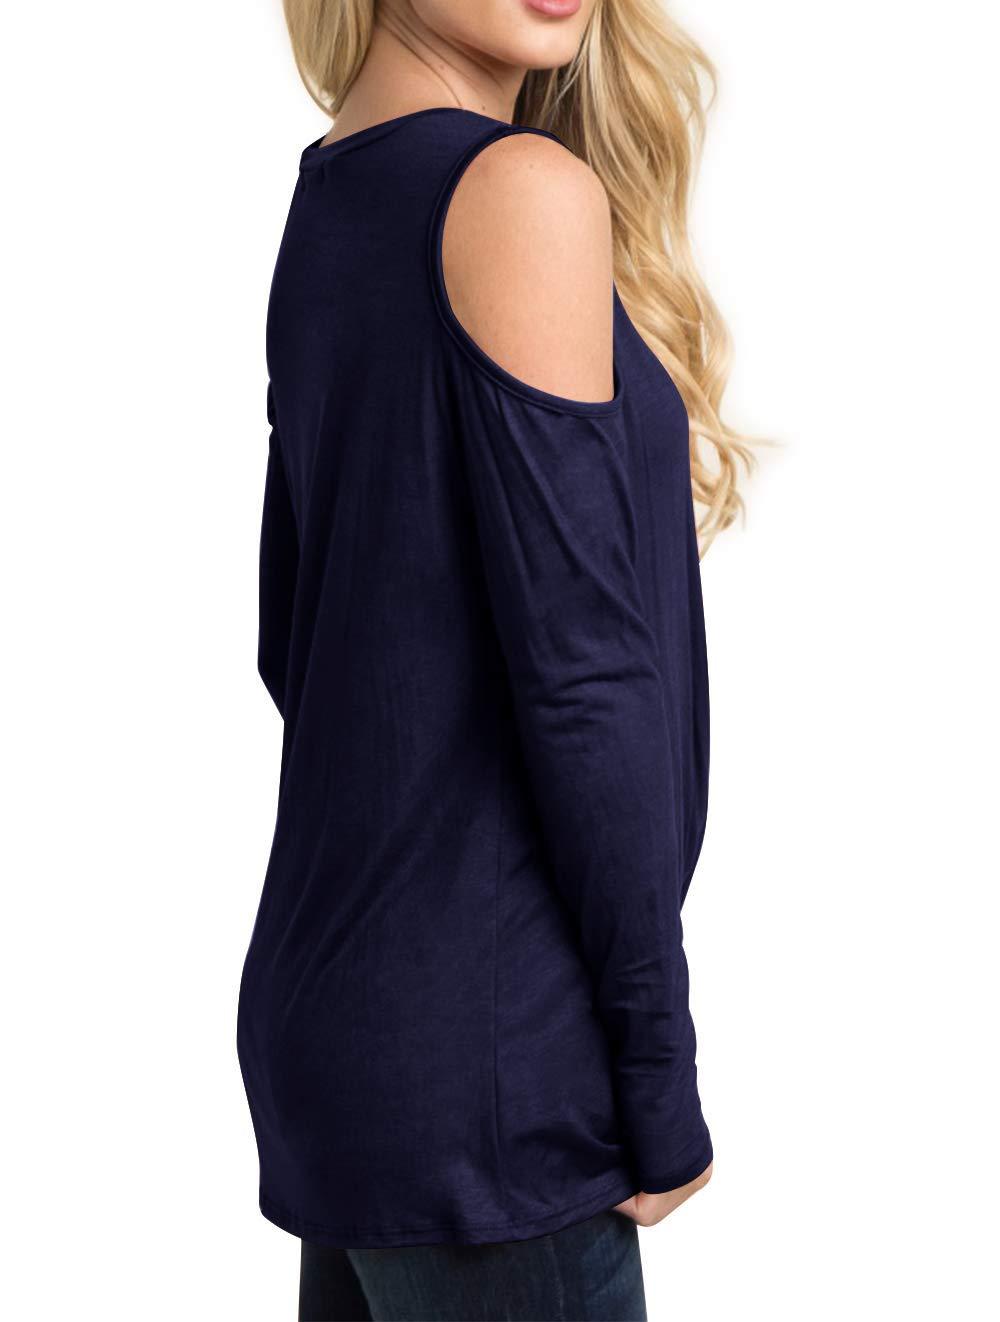 Eanklosco Cold Shoulder Tops Women Off Shoulder Blouses Long Sleeve Shirts with Front Knot Design Tunics Navy Blue M/UK 10